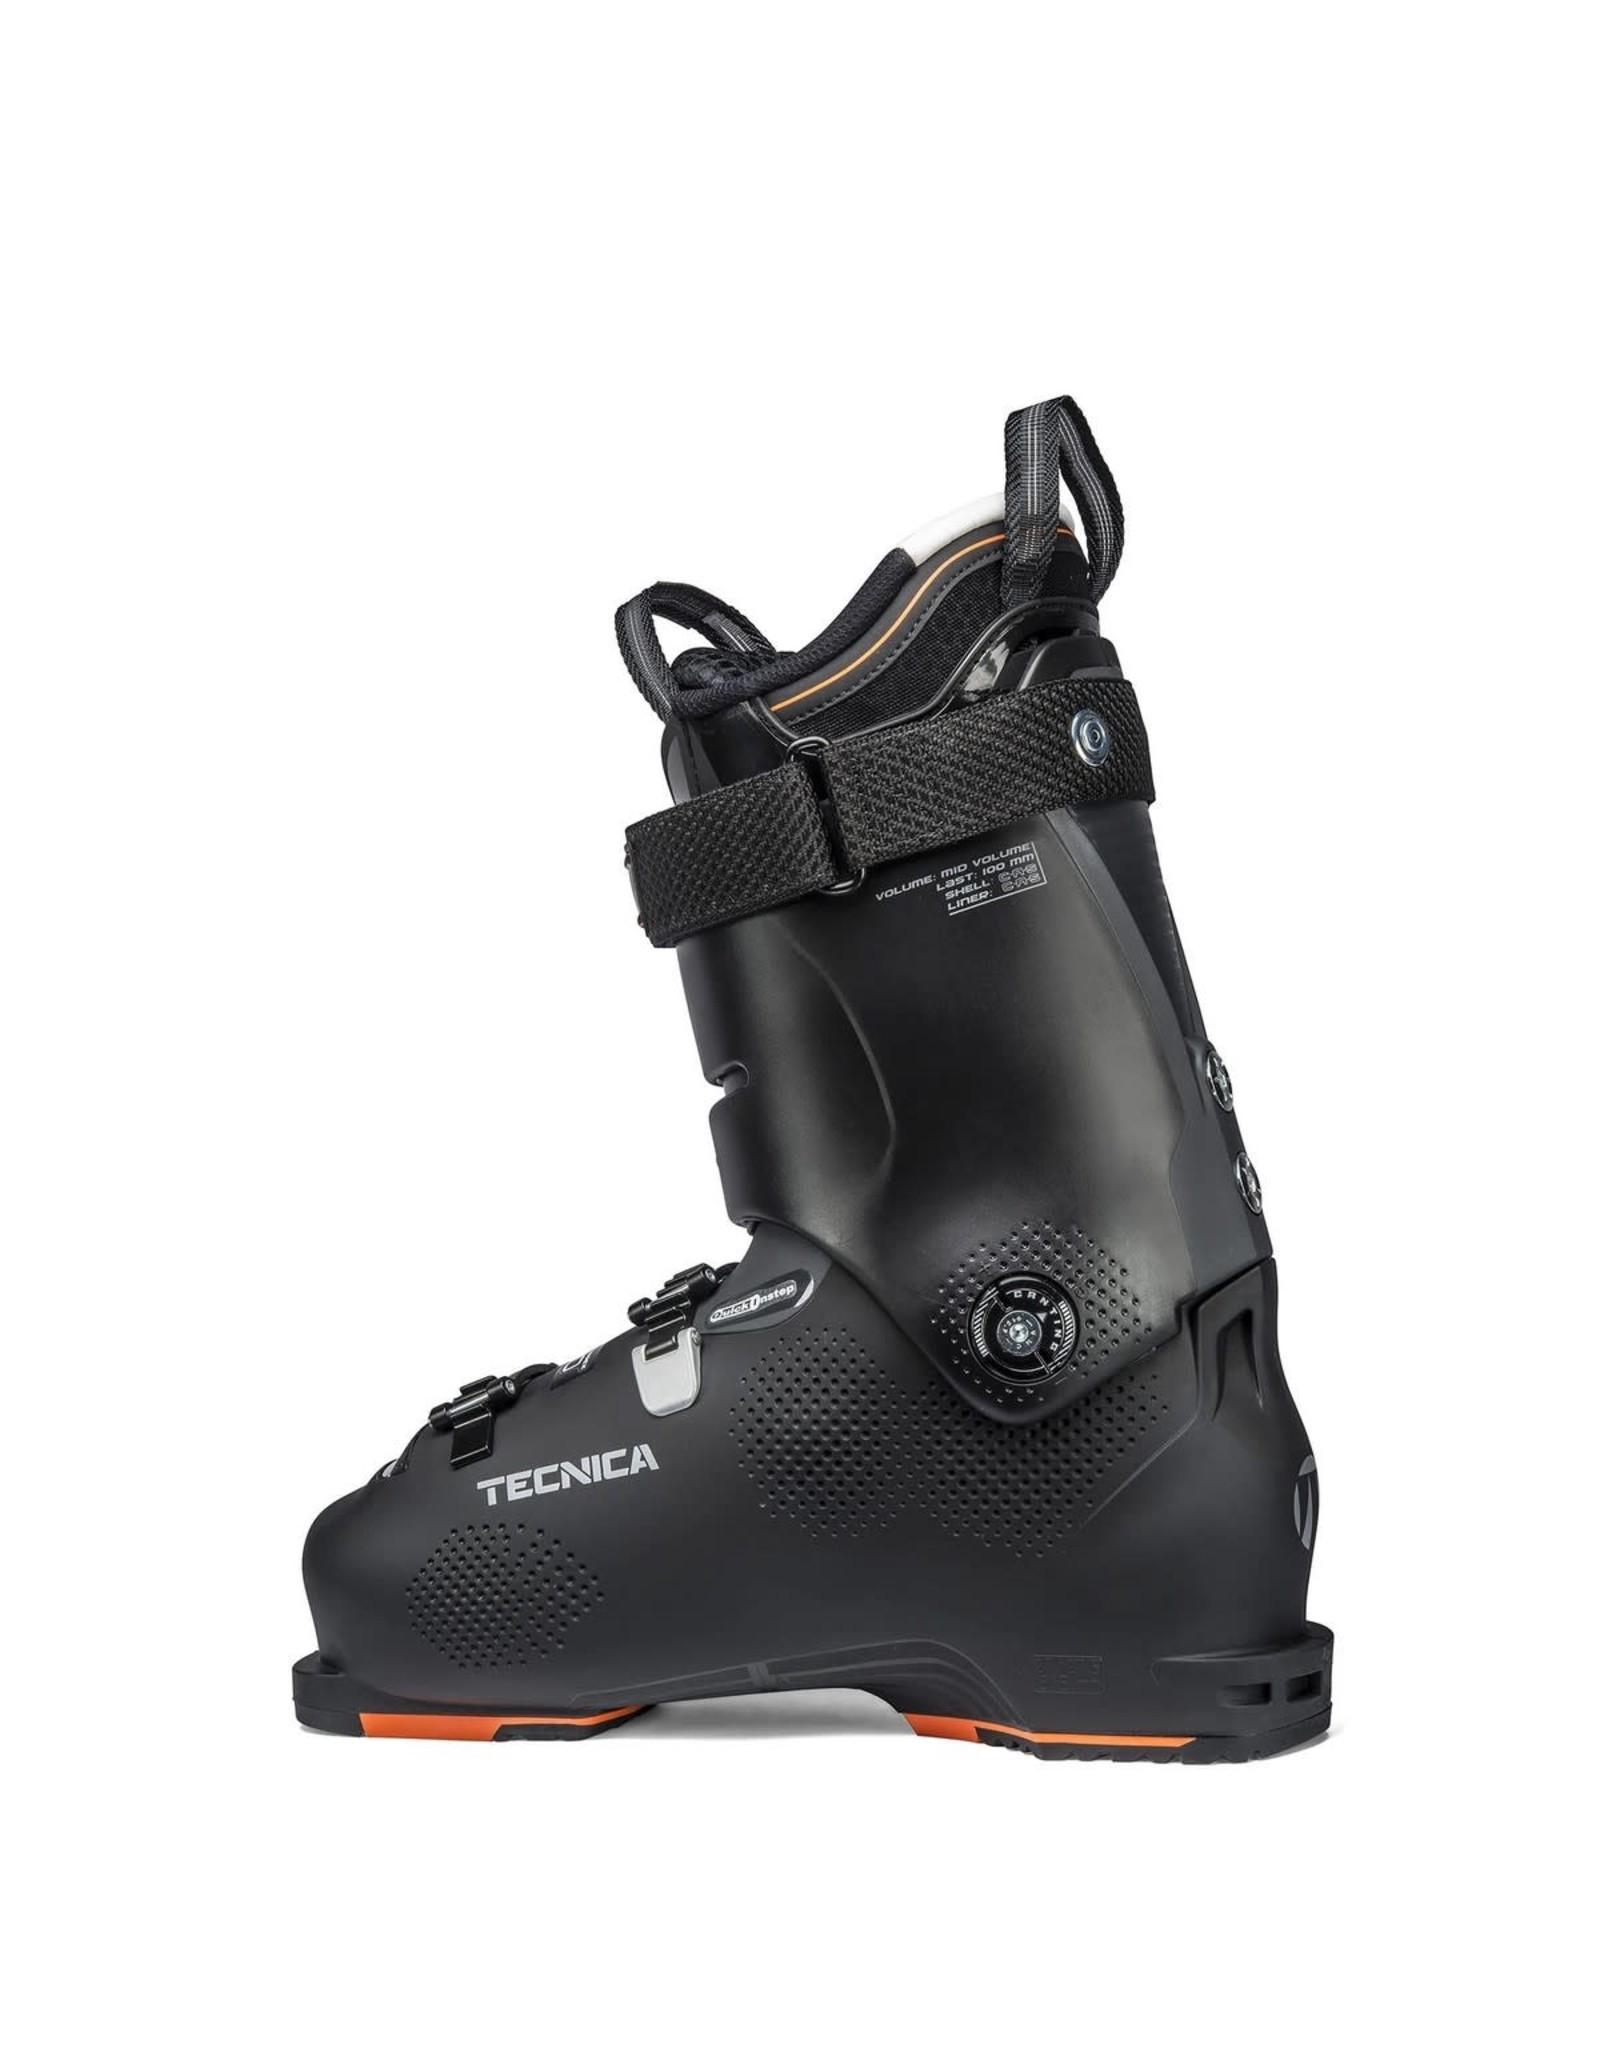 Tecnica Tecnica Mach1 MV 110 Ski Boots - Men